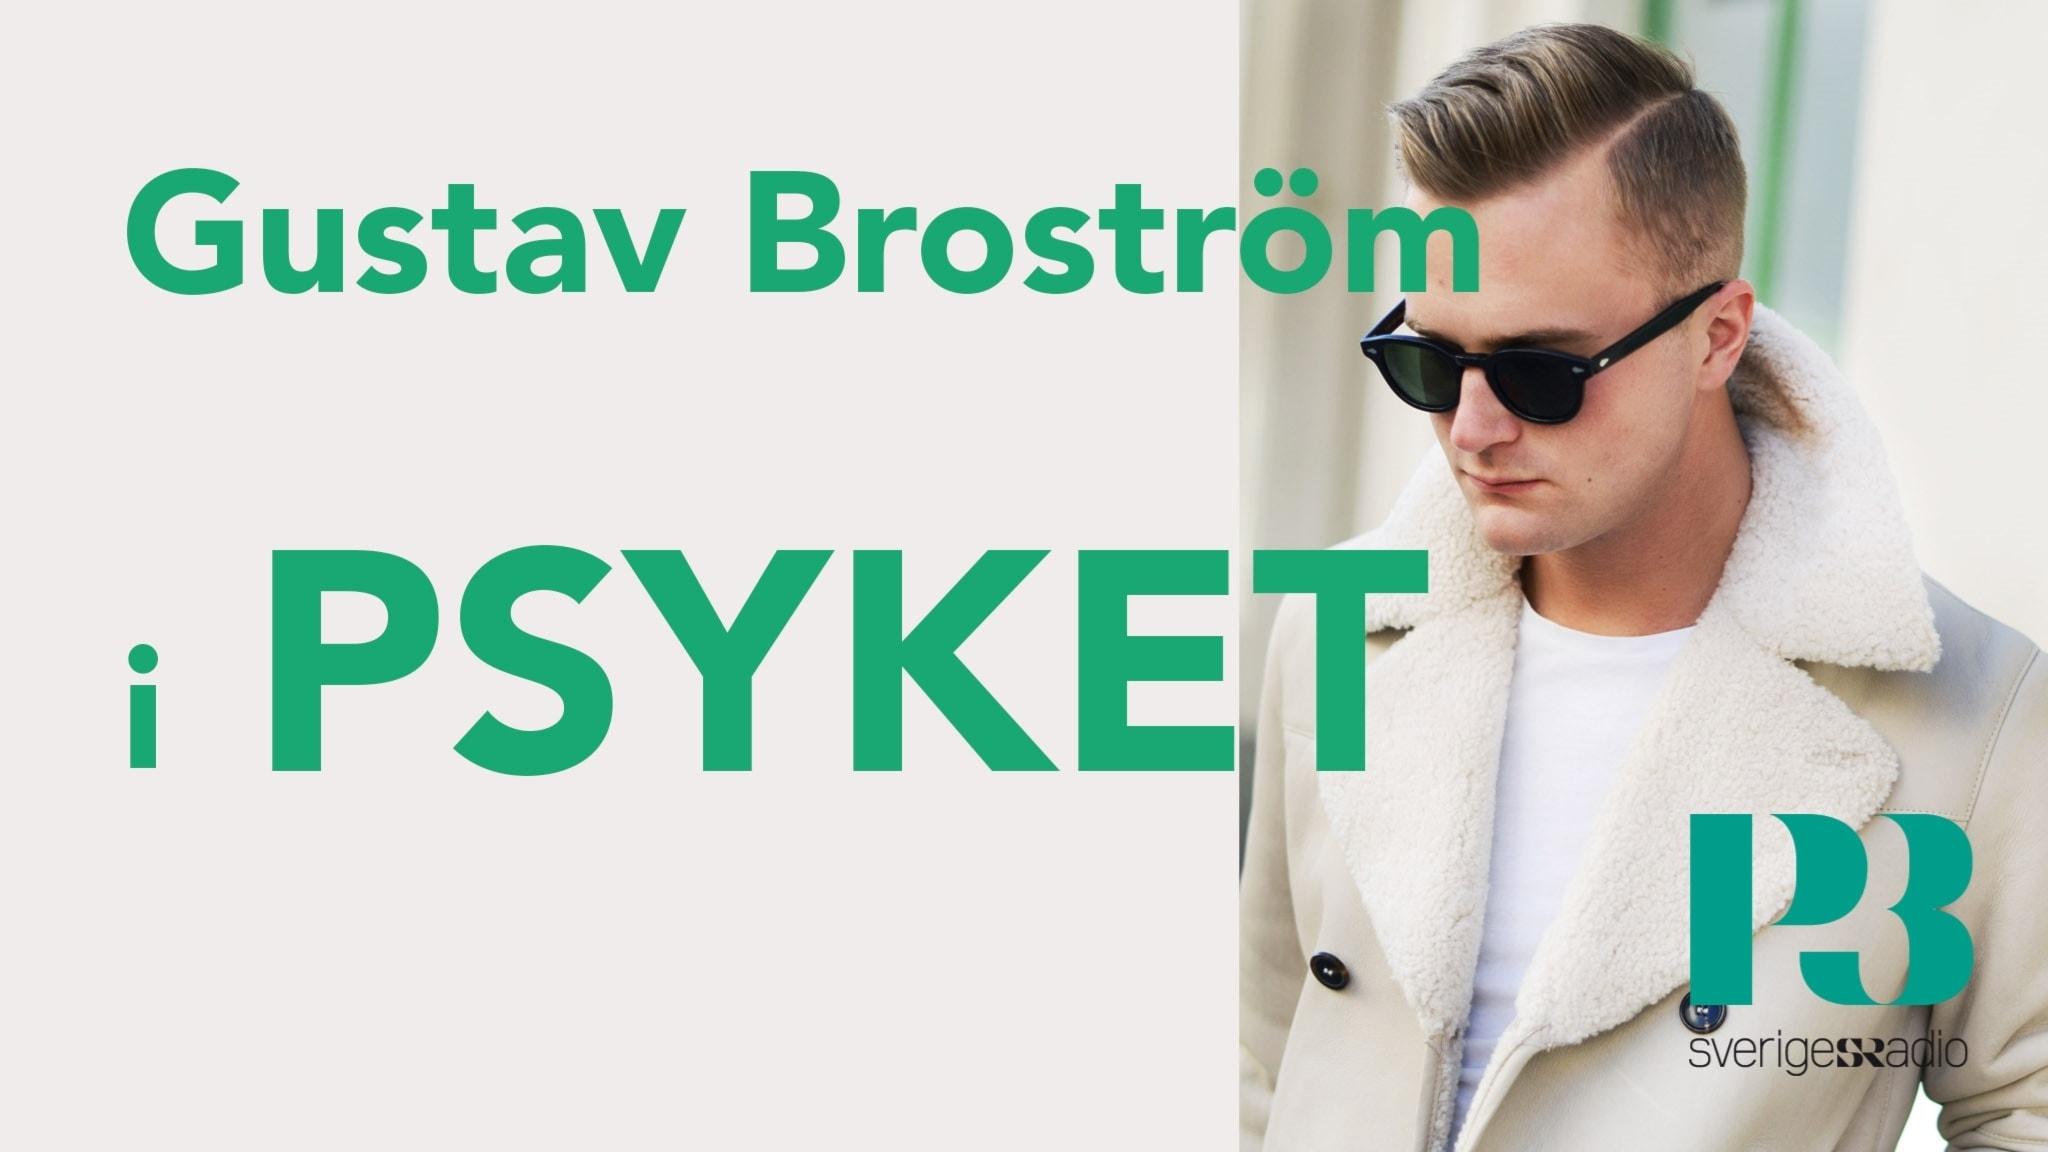 Gustav Broström